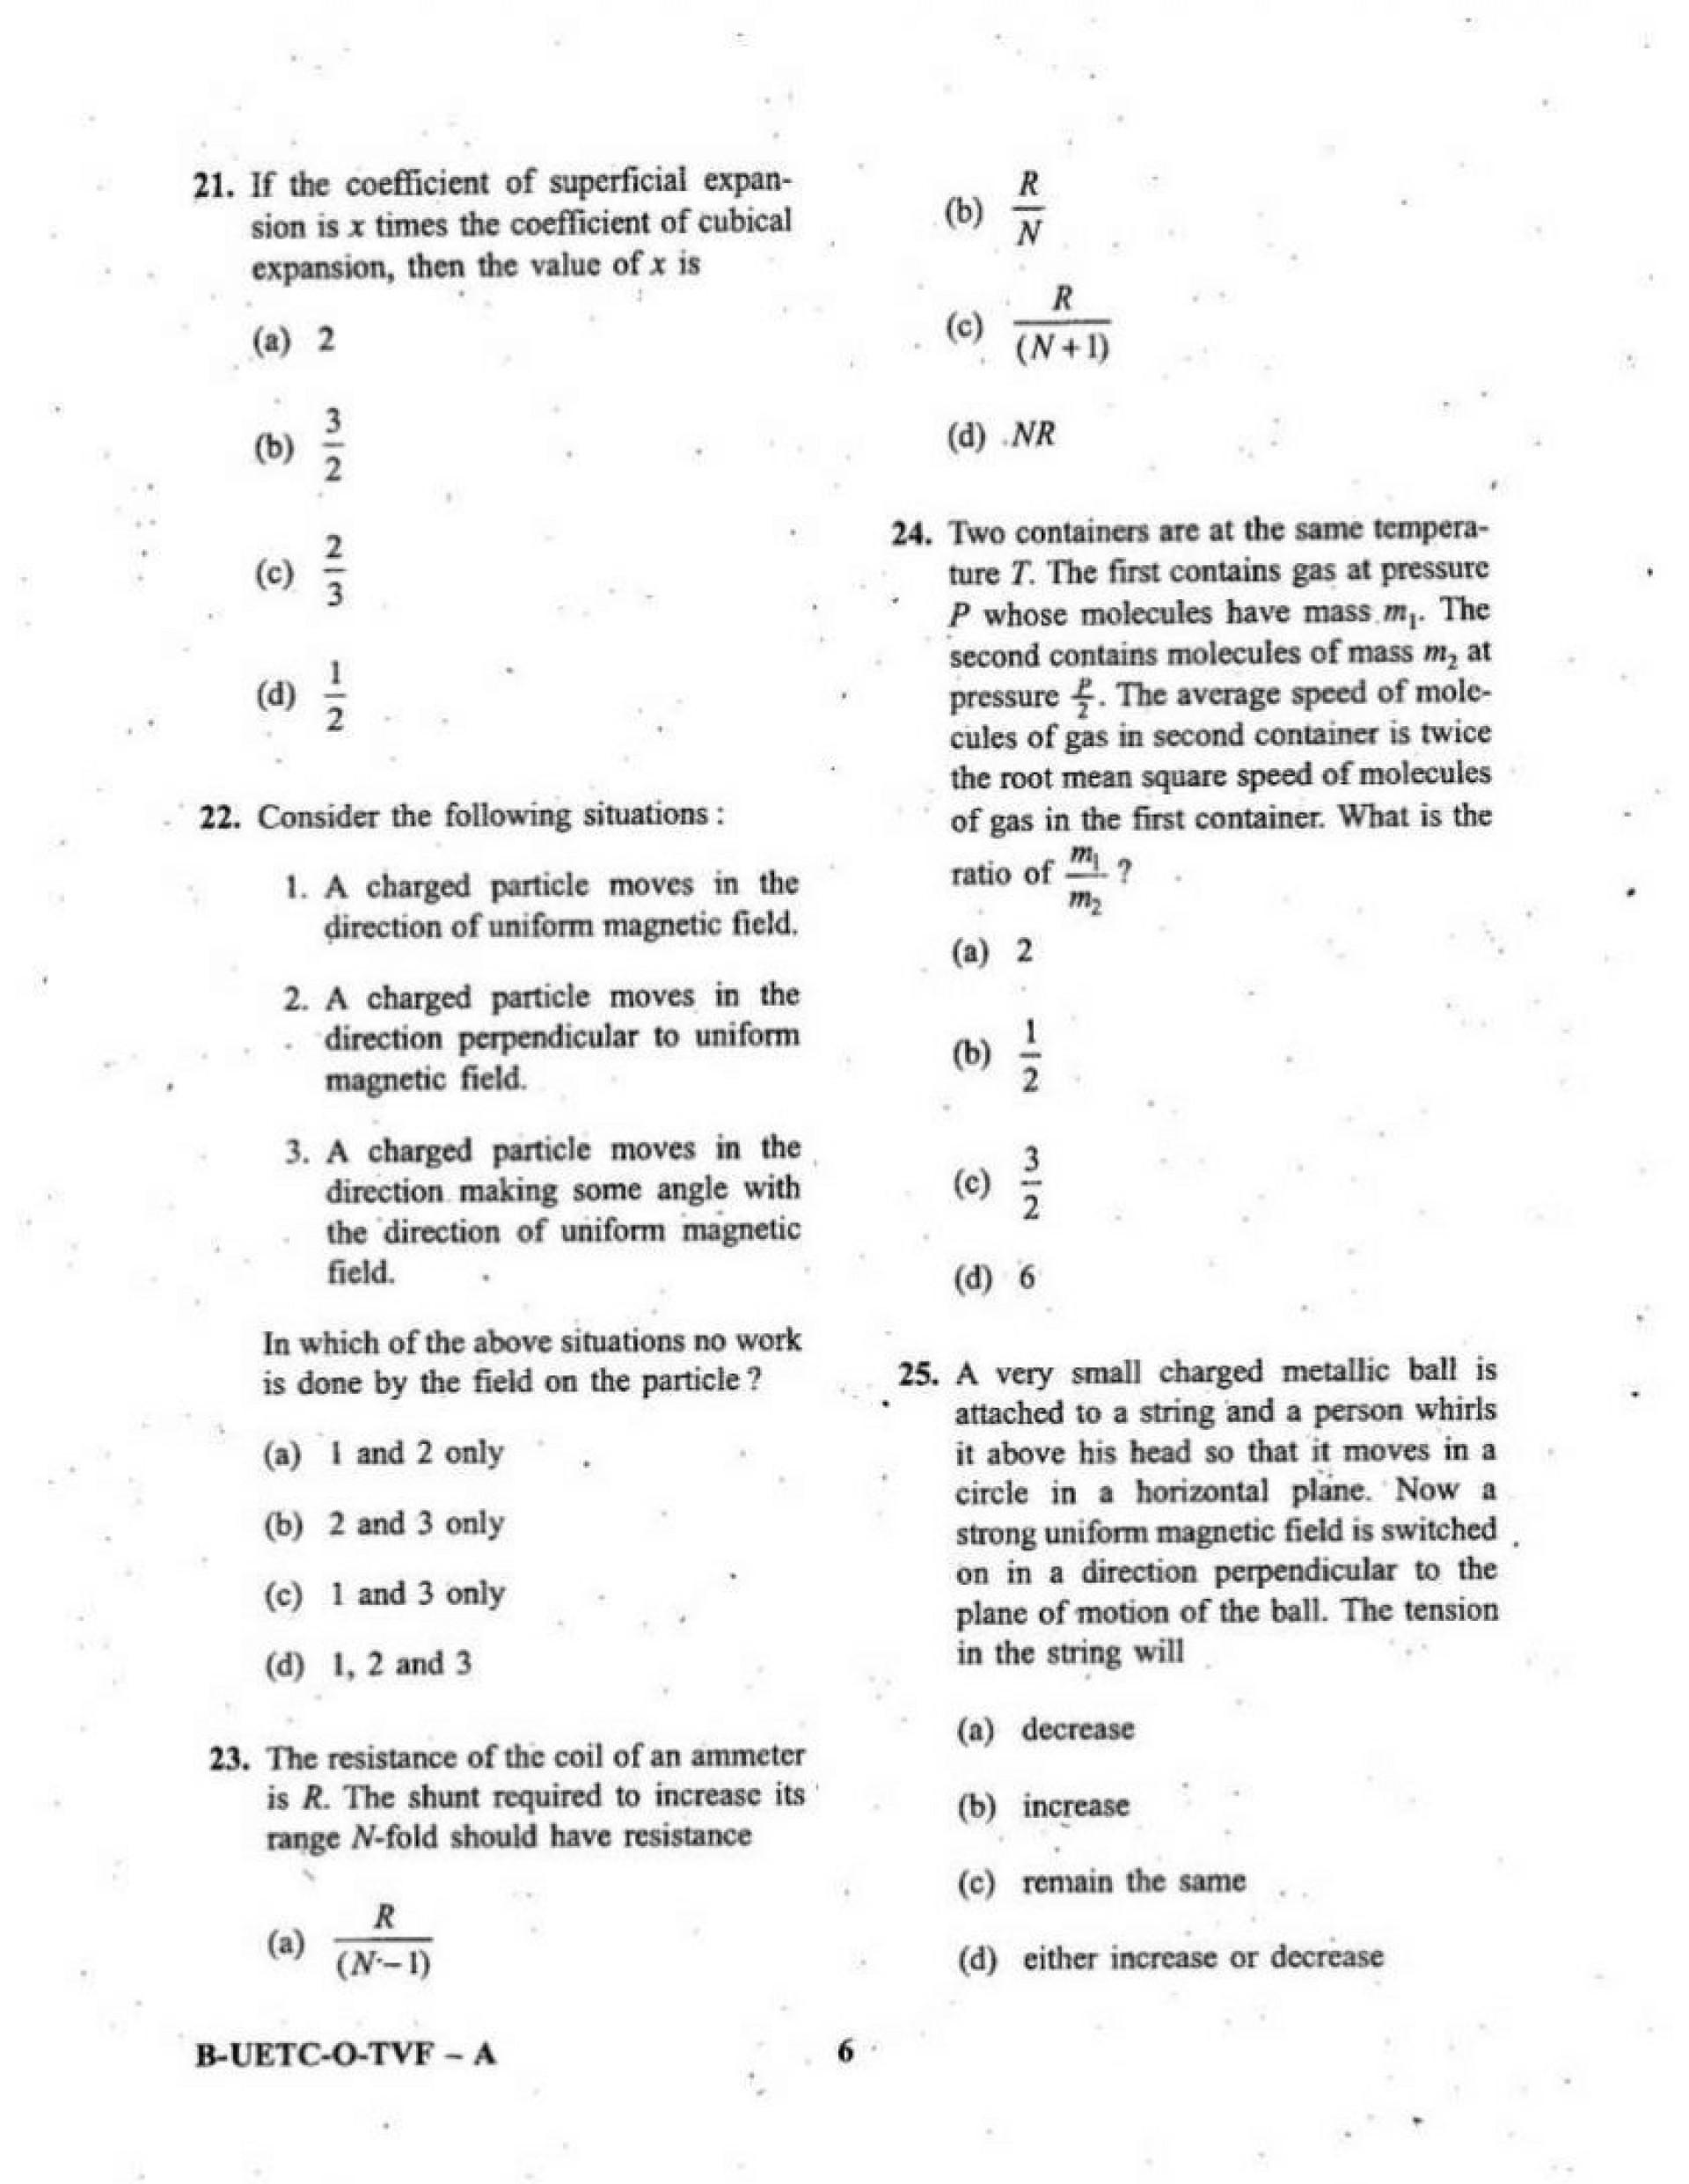 009 Essay Example Holt Online Scoring Pdf Darwinromero Us Best Card Templates Upsc Scorer Pearson Sat Free Student 840x1086resizeu003d618799u0026sslu003d1 Automatic Singular Grader 1920